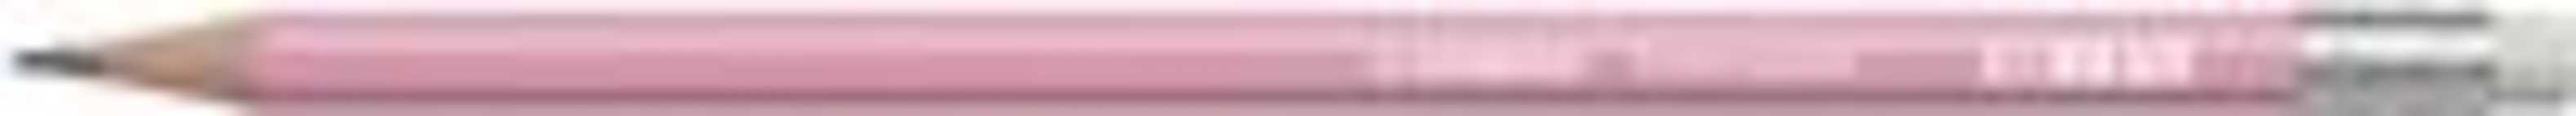 Stabilo potlood Swano pastel, roze, met gom